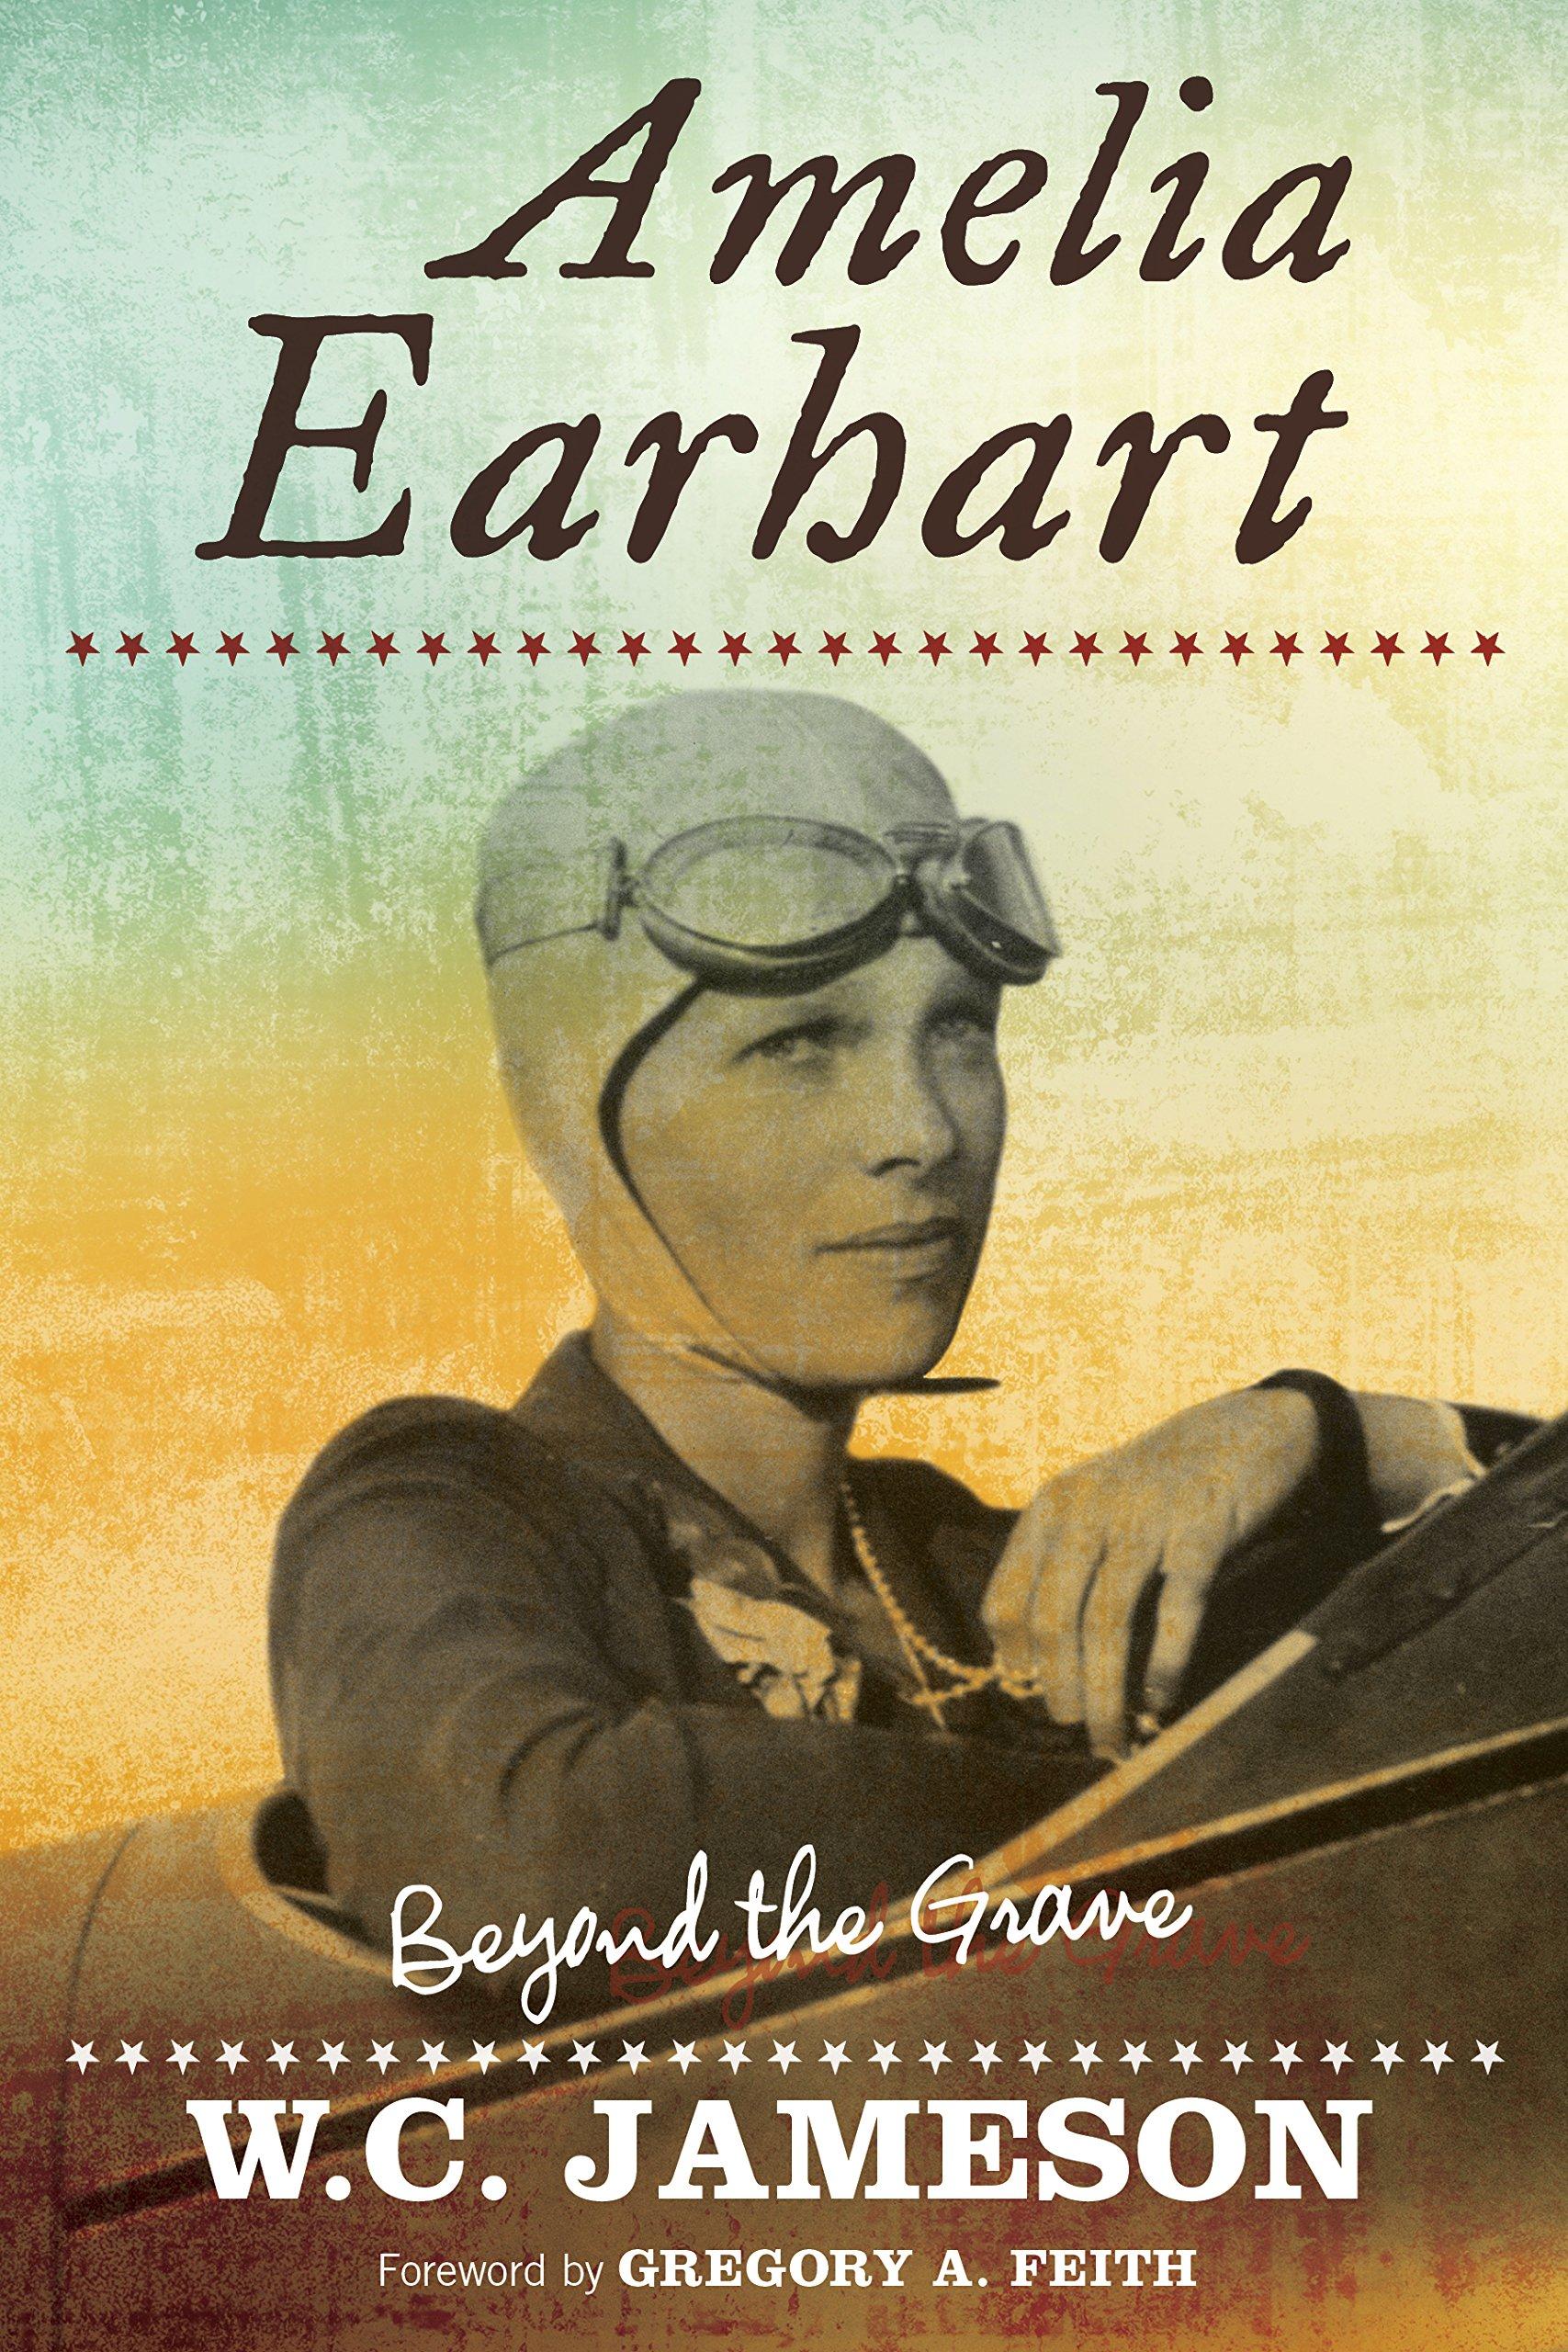 91an9Dda9KL - Amelia Earhart: Beyond the Grave